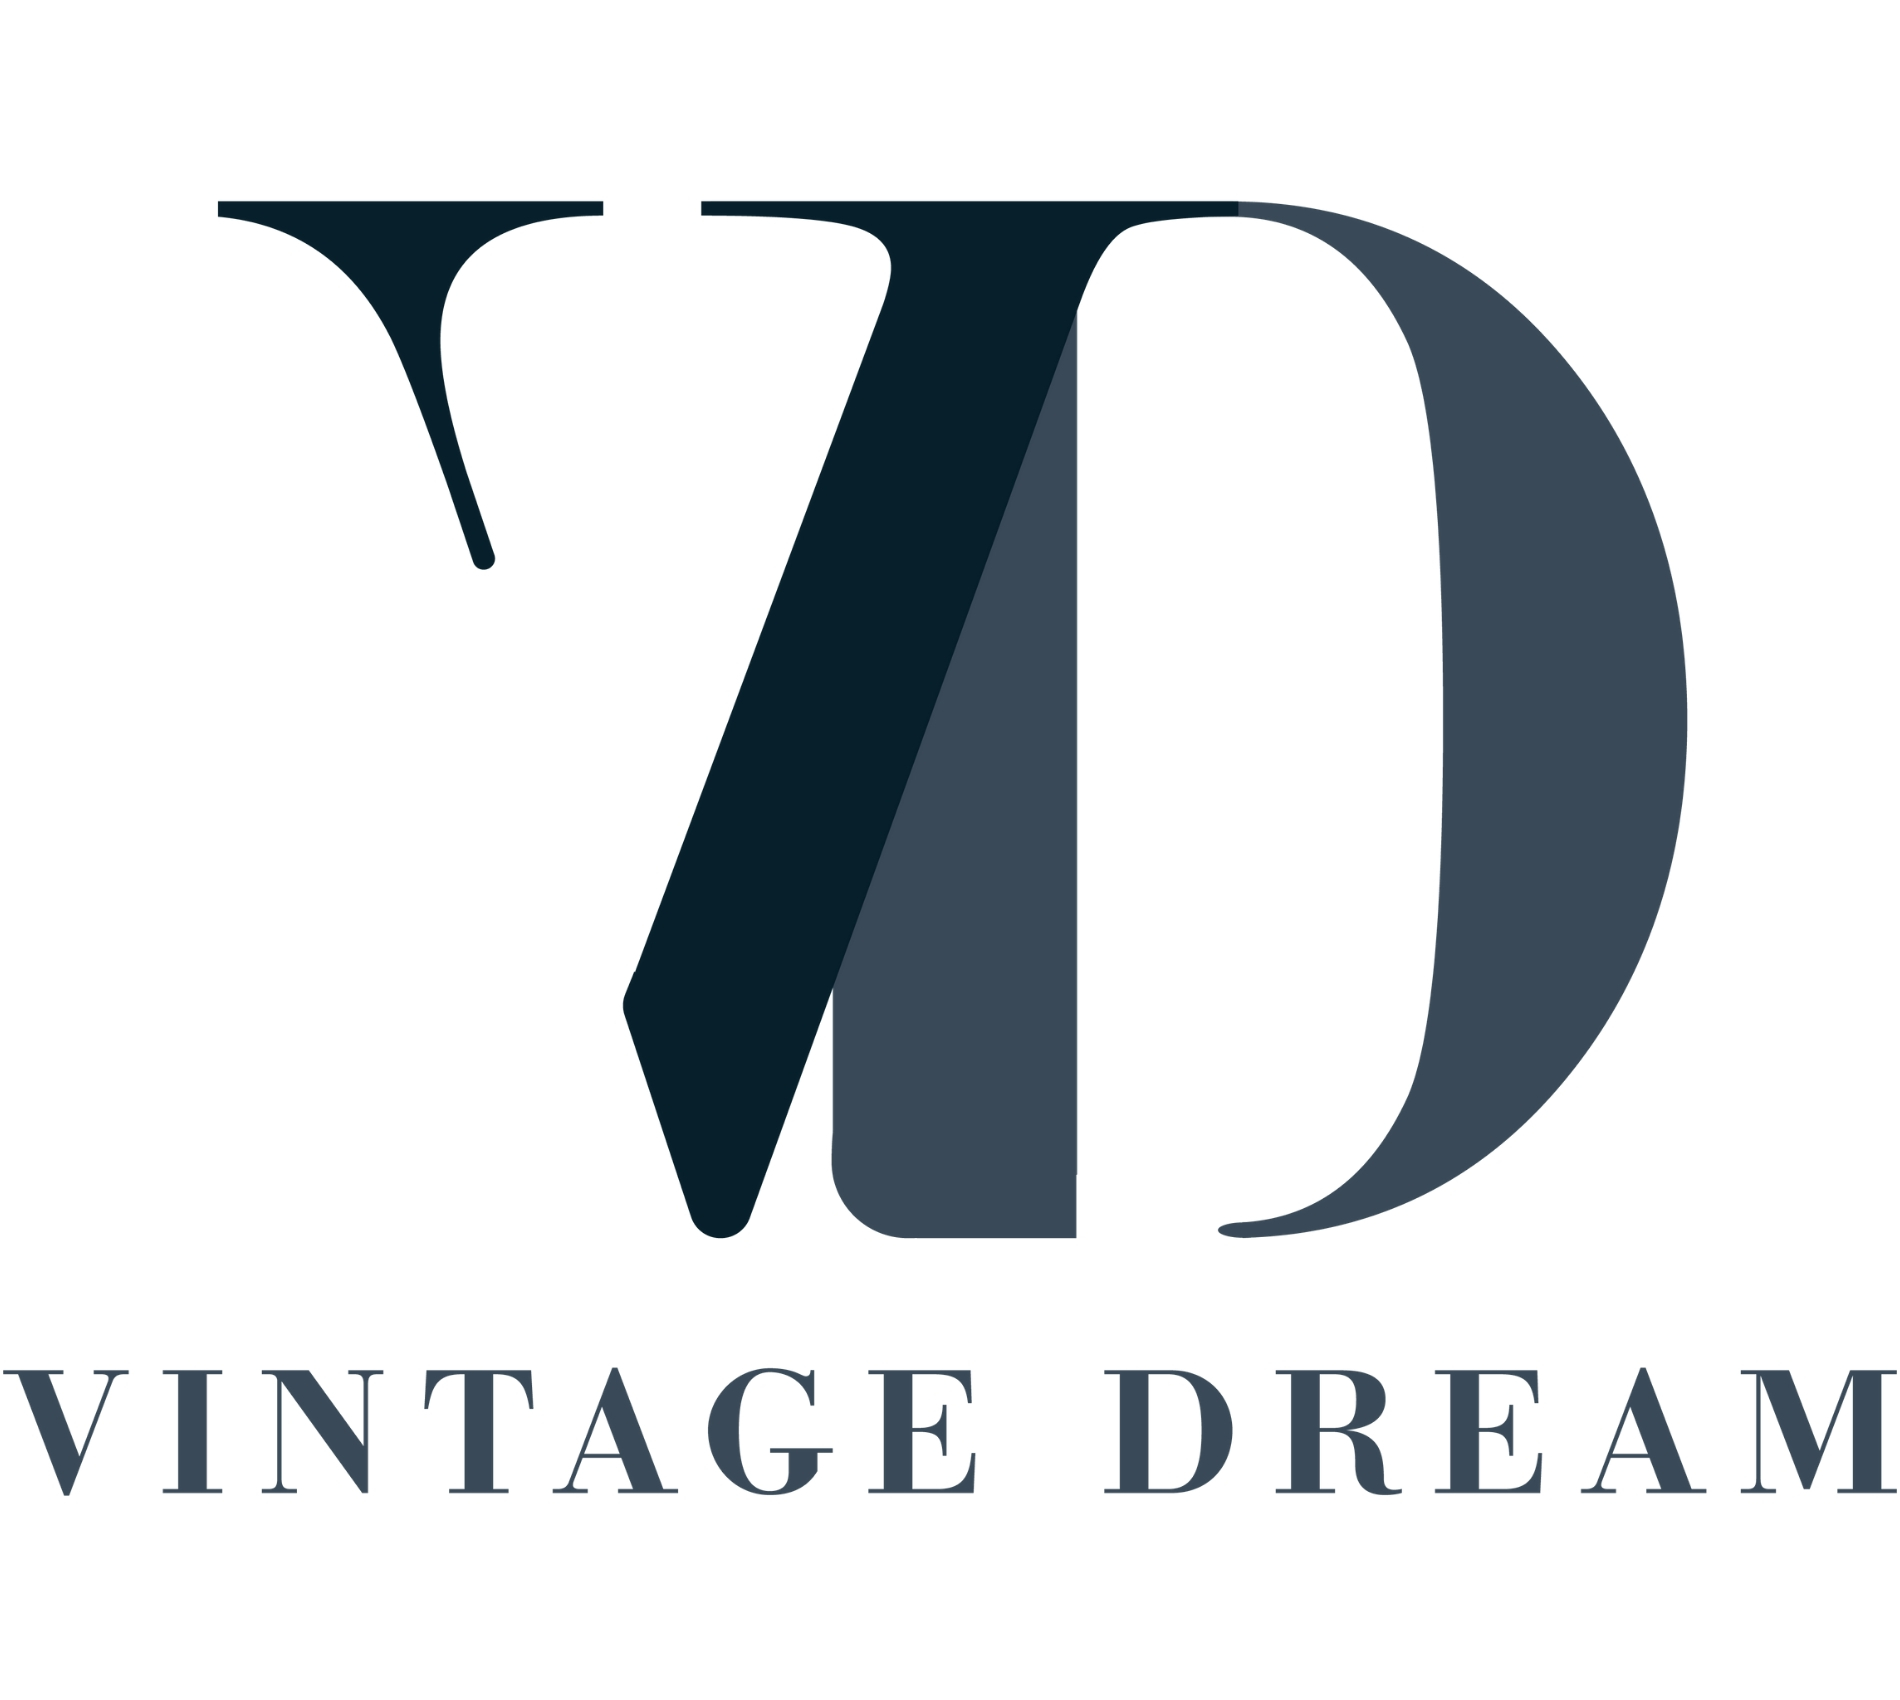 VintageDream